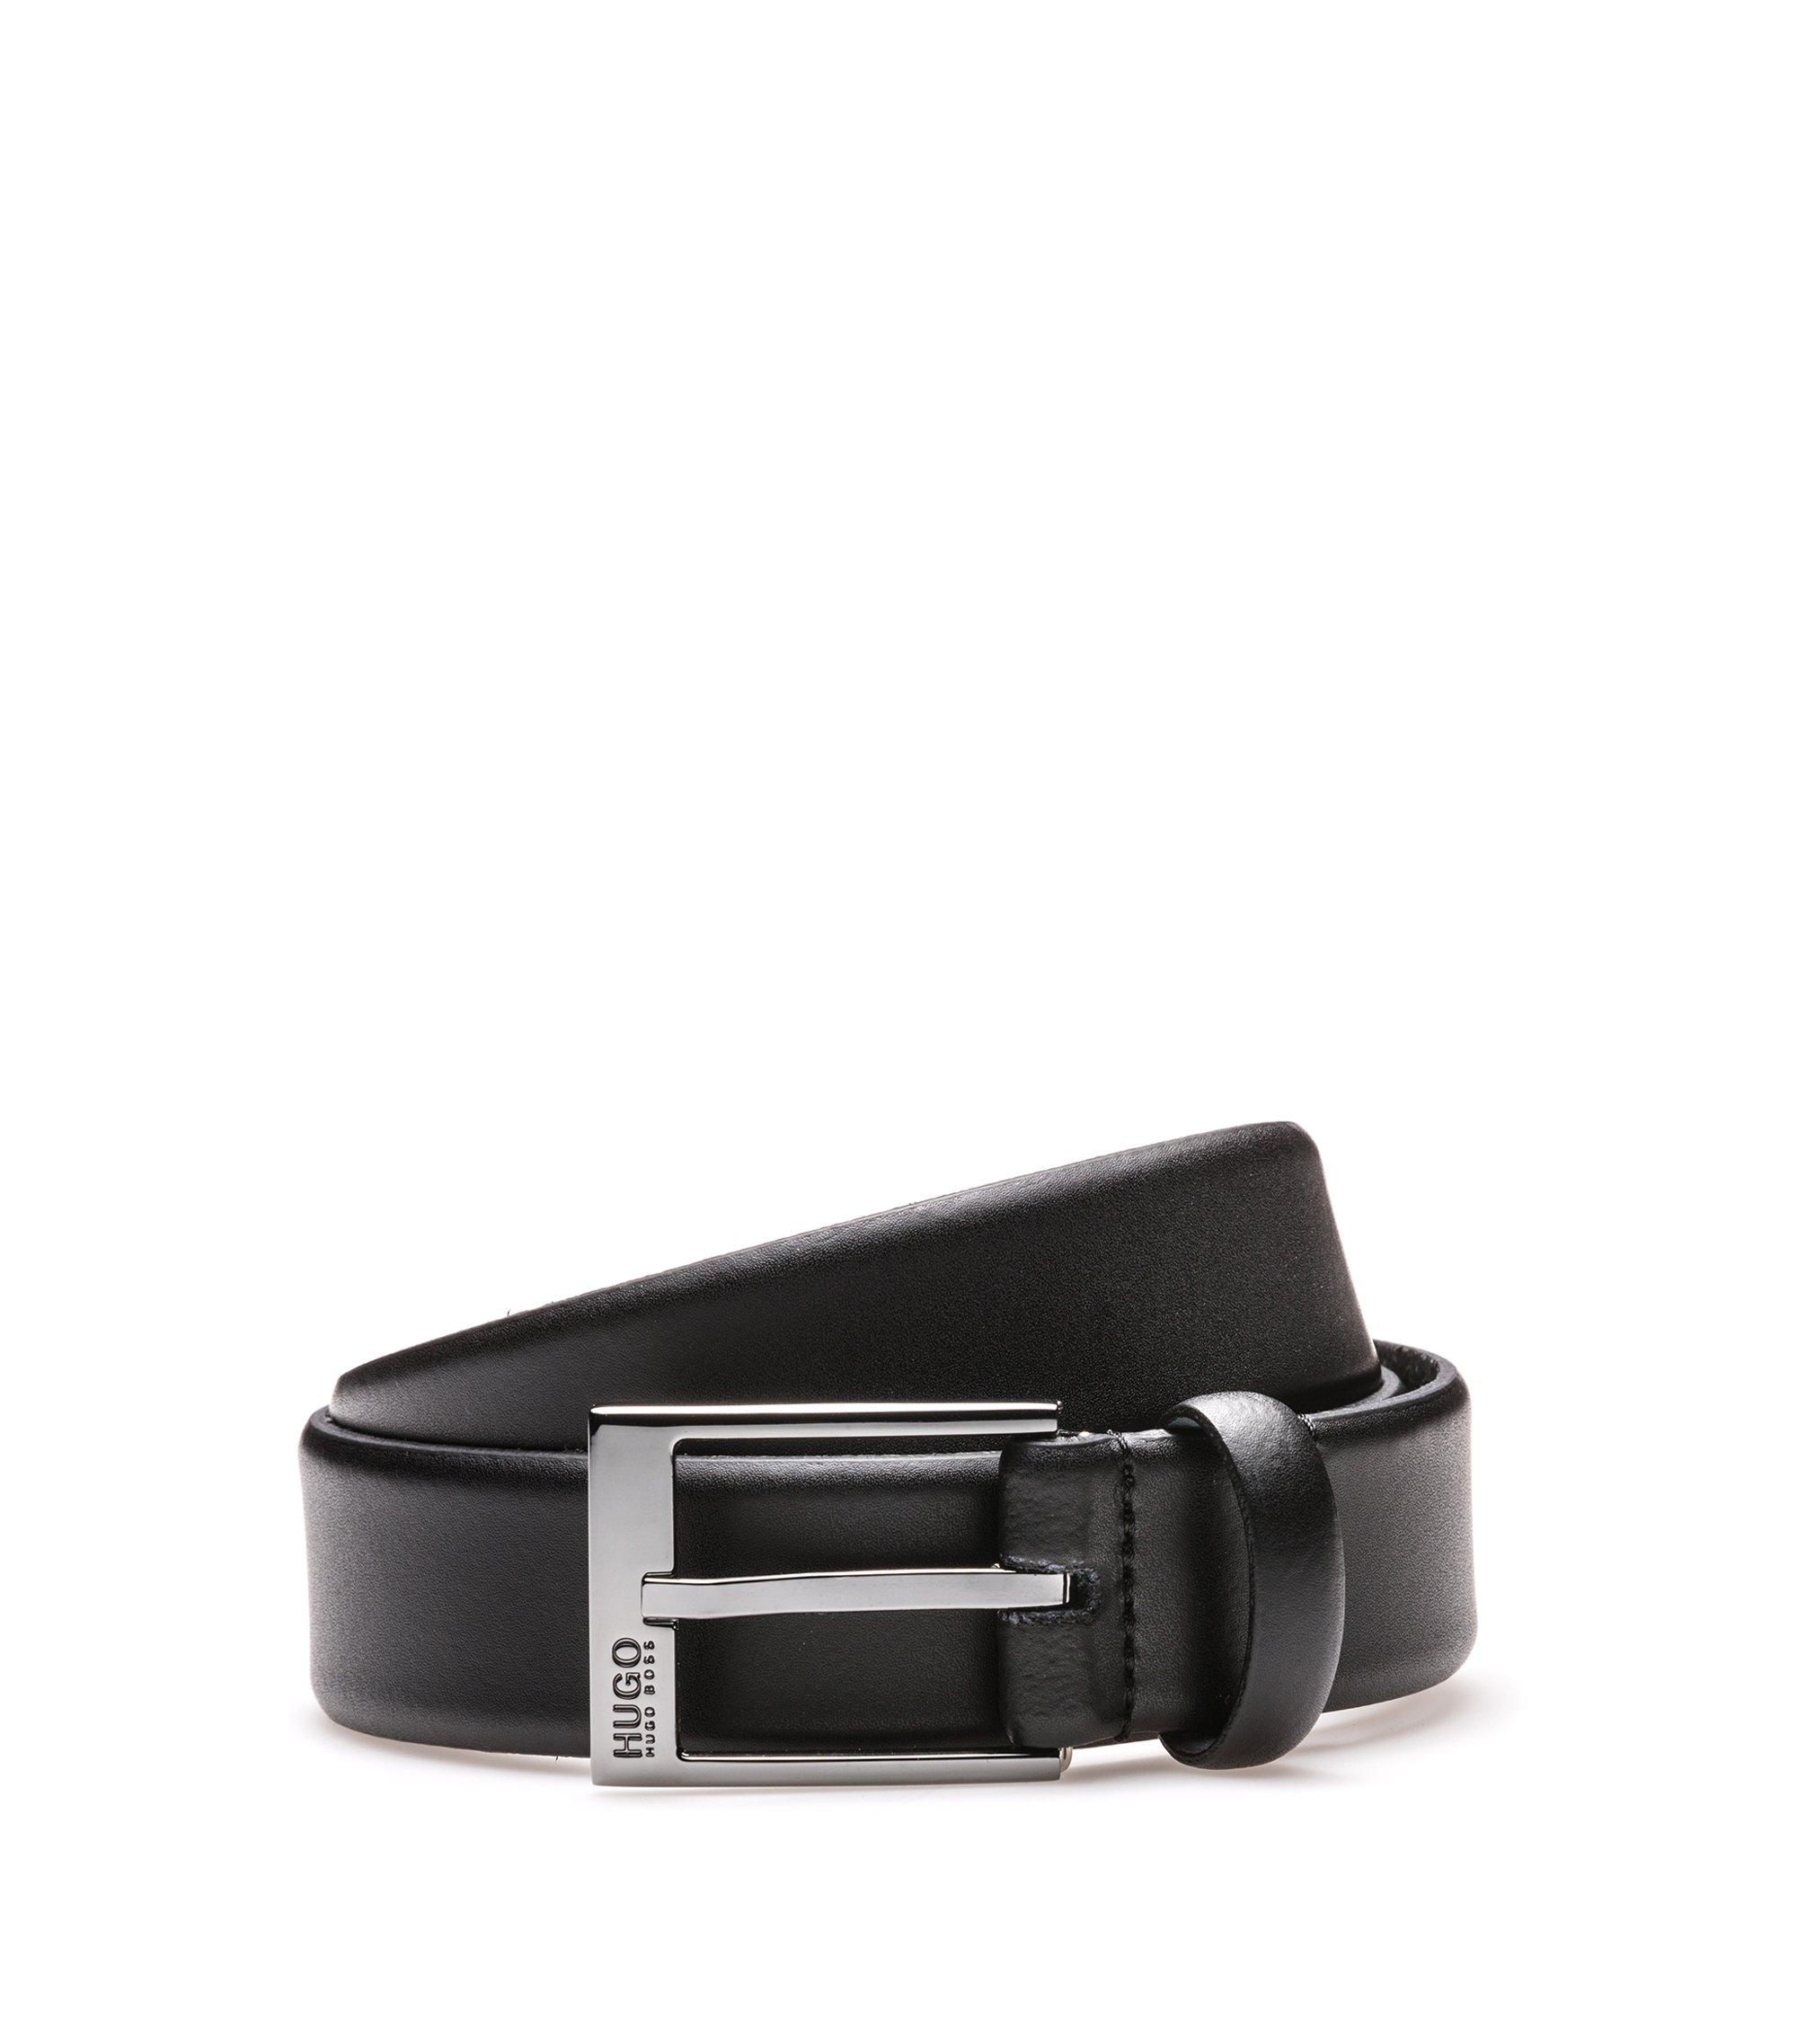 Matt-leather belt with polished gunmetal hardware, Noir